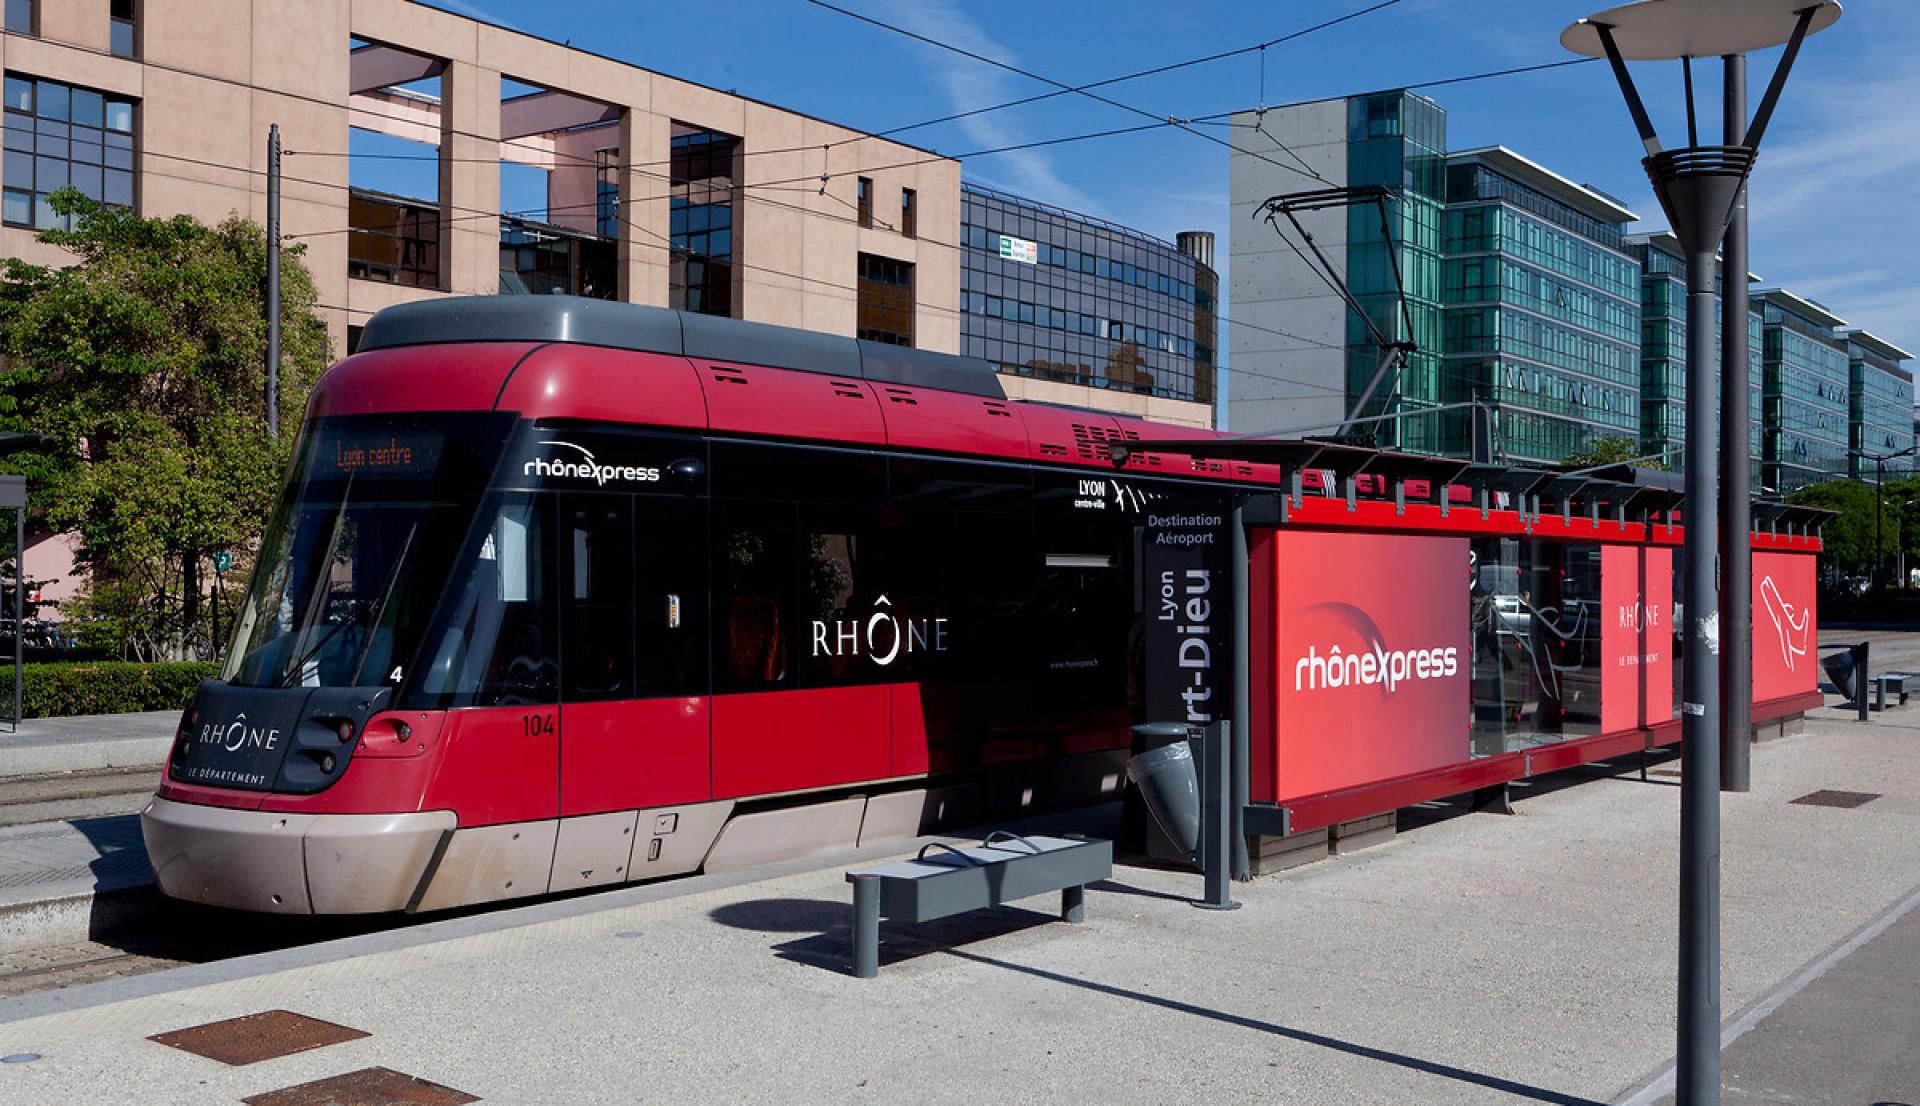 Rhônexpress, the tram driving momentum in Lyon